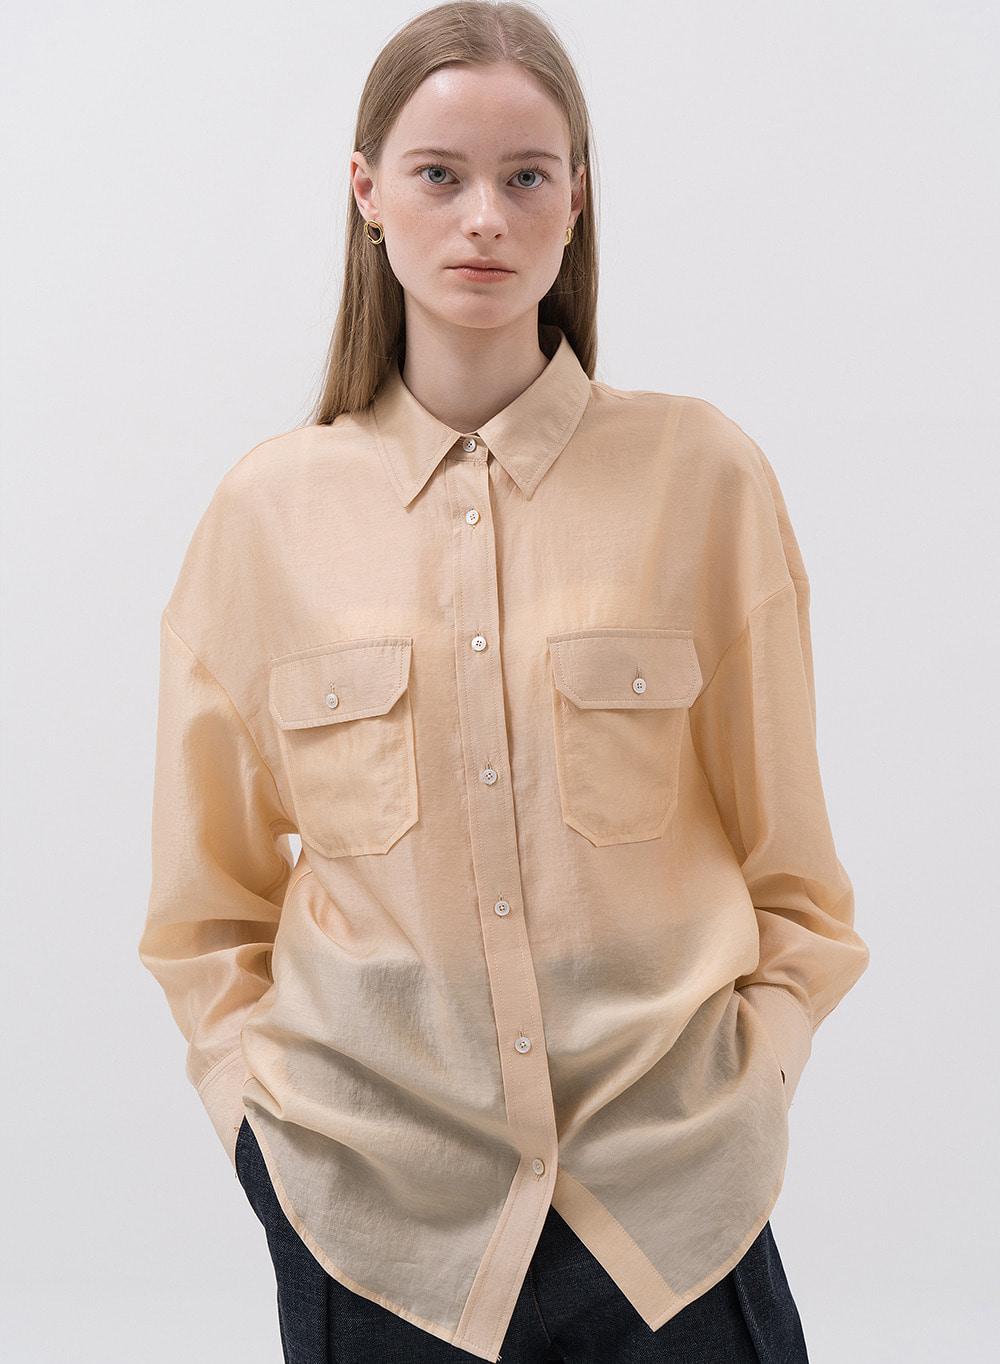 SS20 Sheer Shirt Mustard